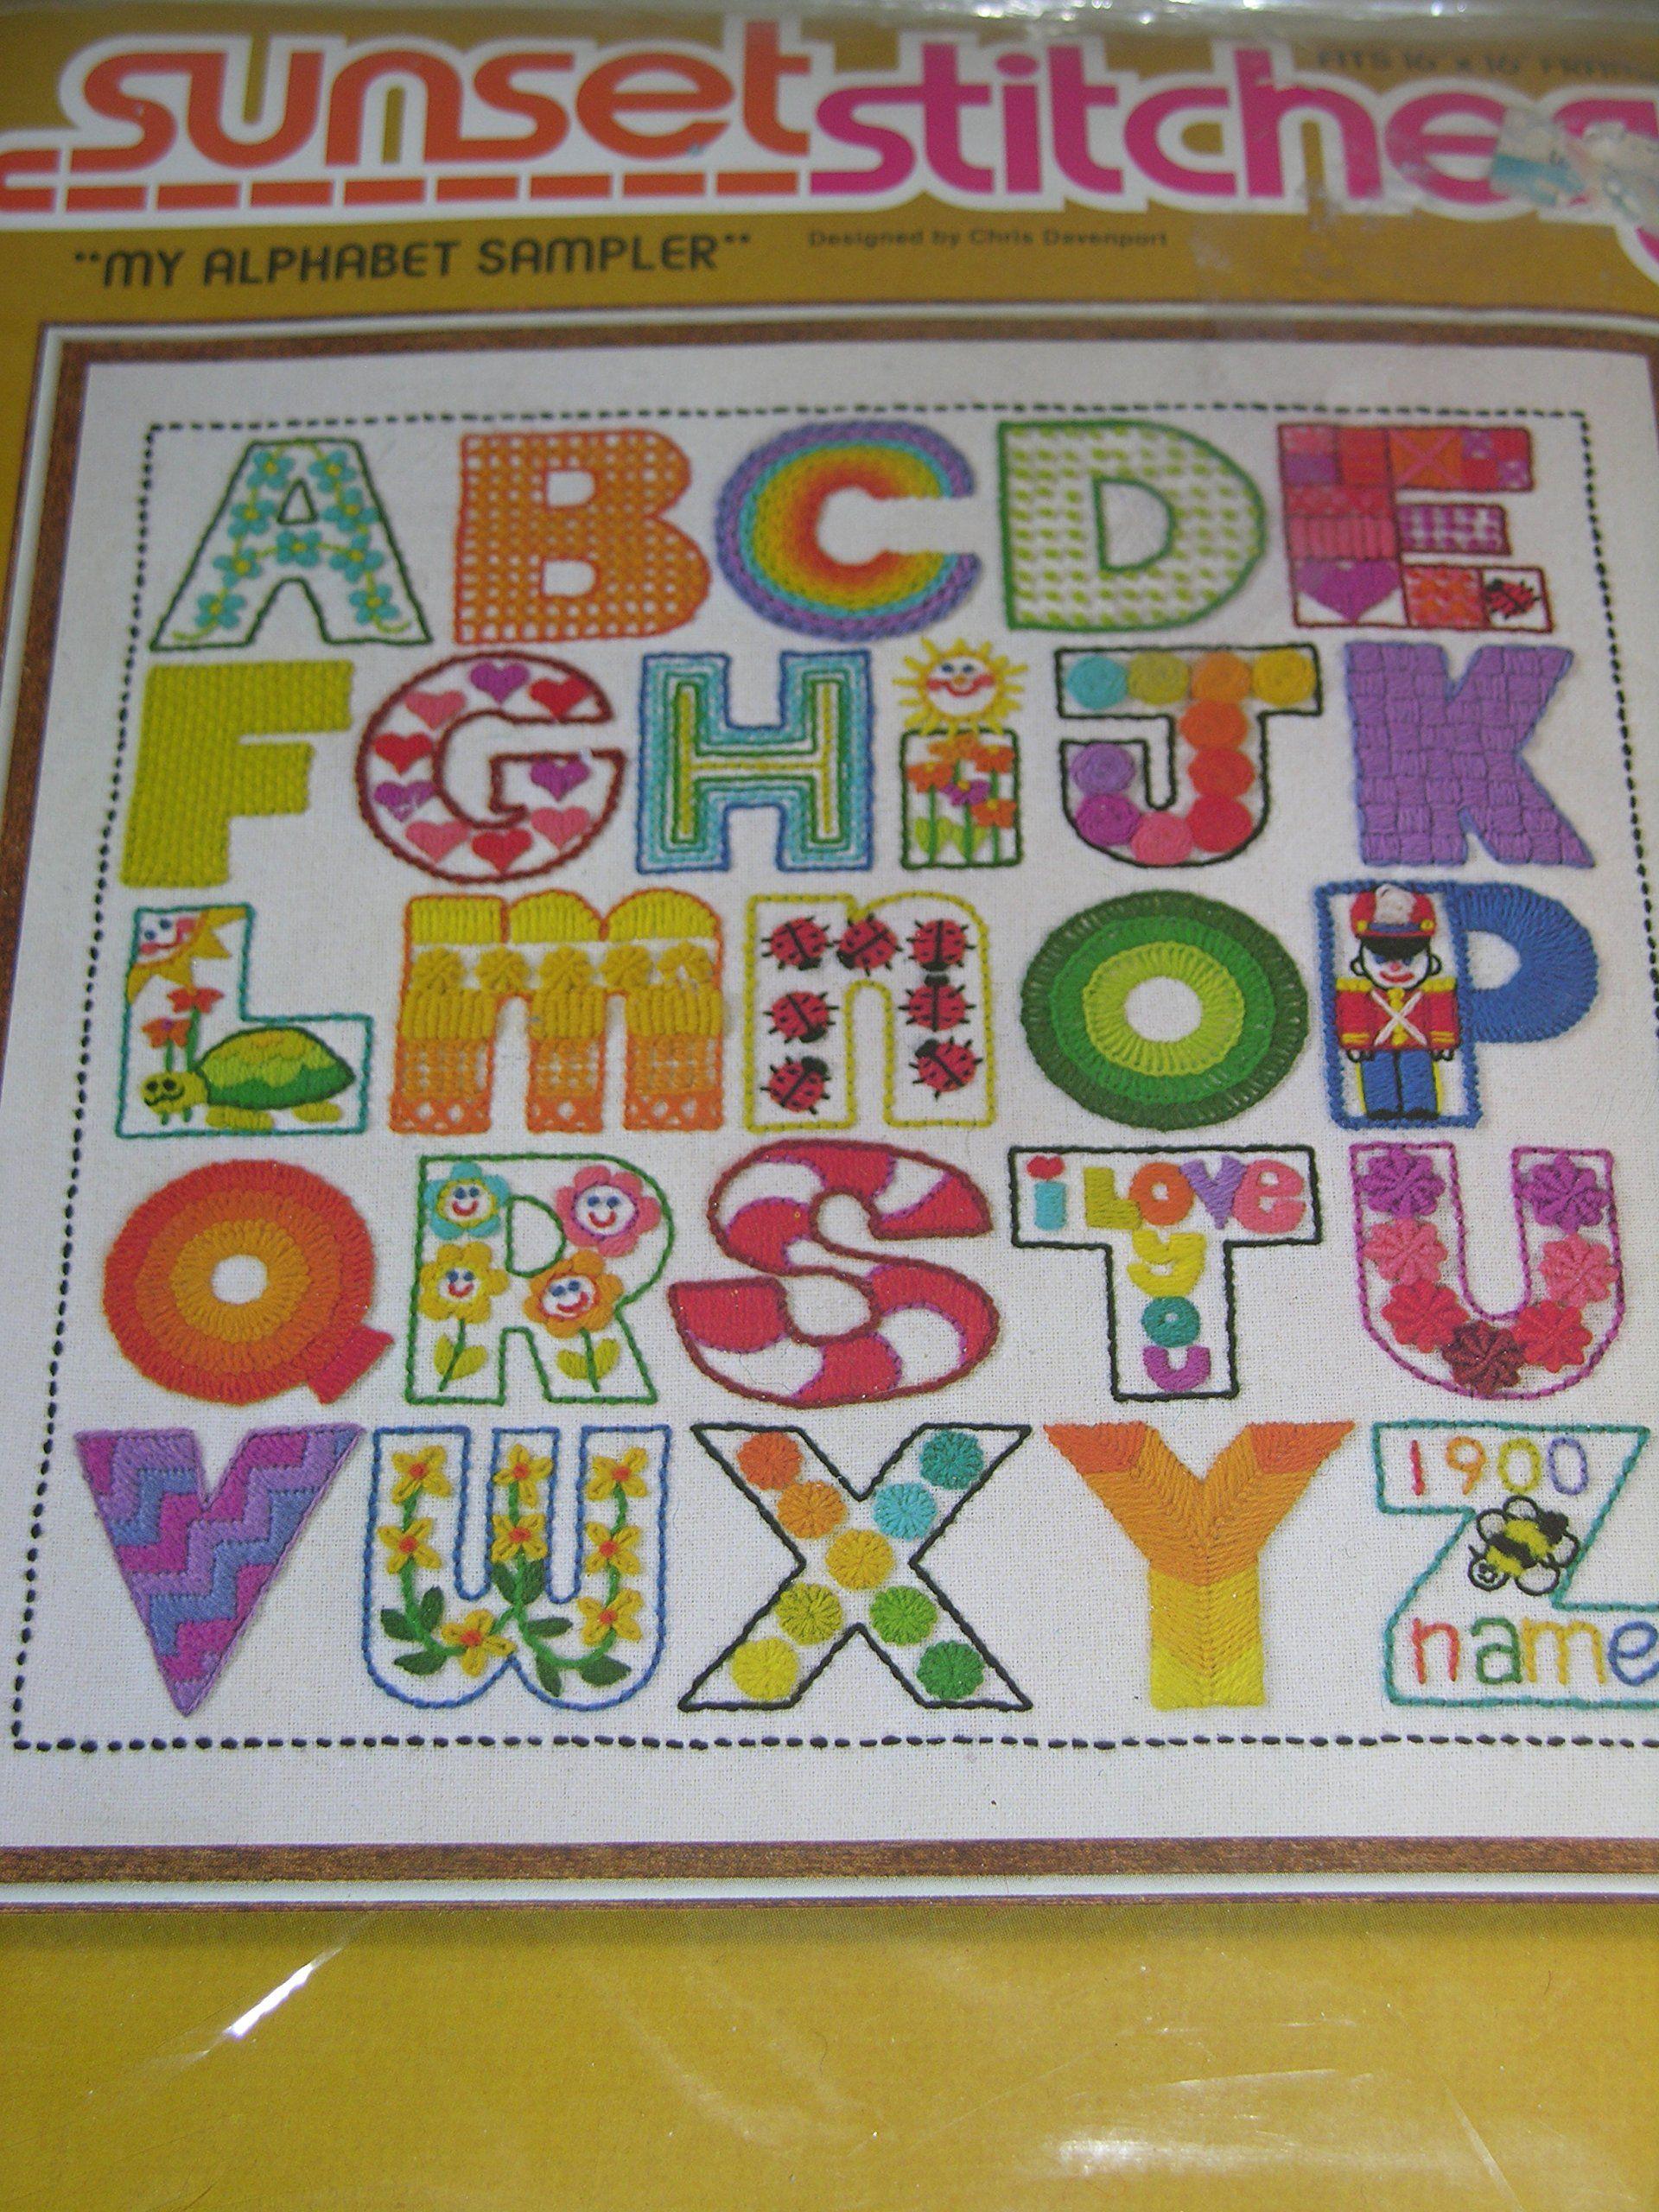 CHRISTMAS WREATH FANTASY Sunset Stitchery Crewel Embroidery Kit Vtg 1979